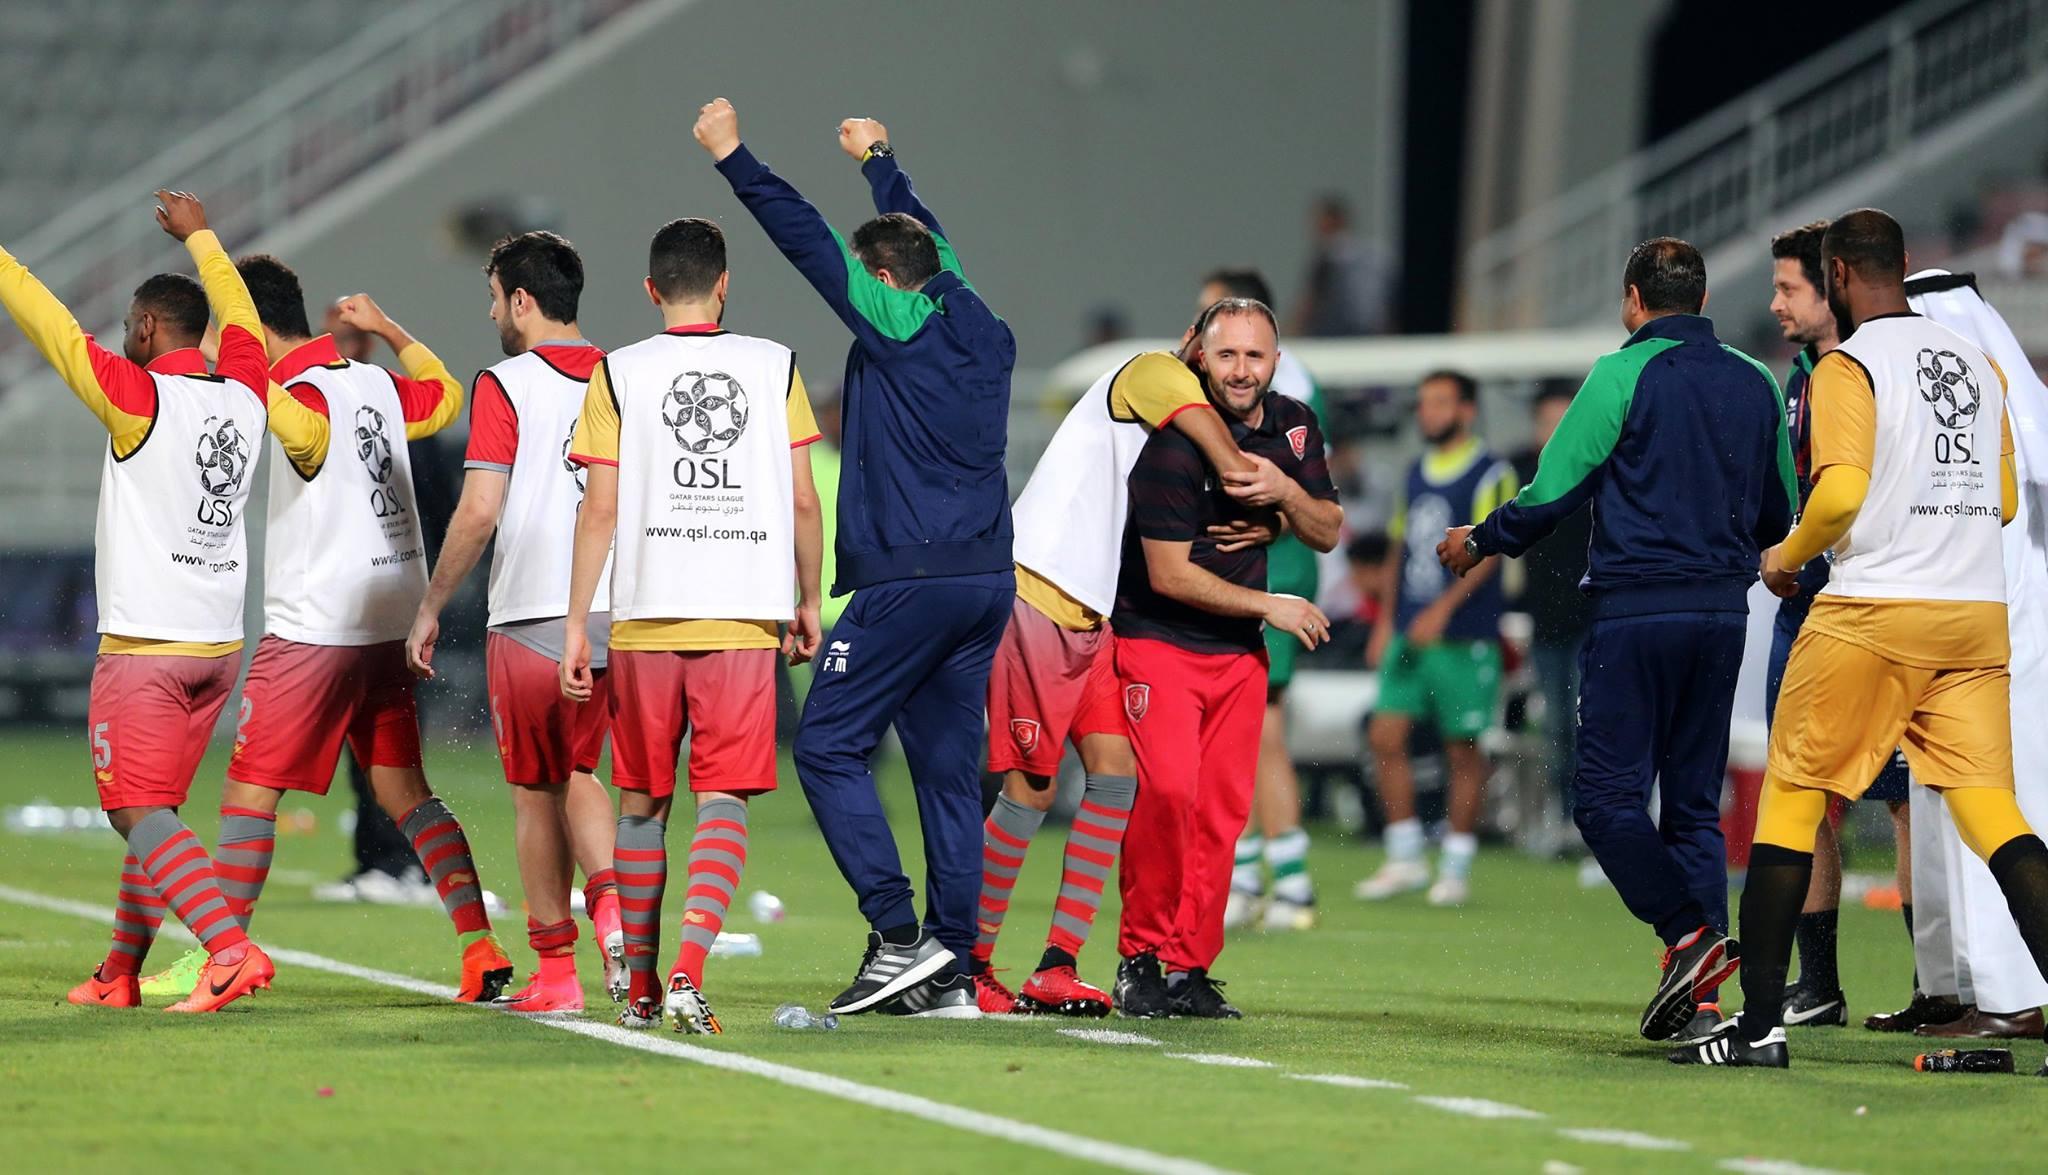 djamel belmadi coach joie lekhwiya champion qatar 2017